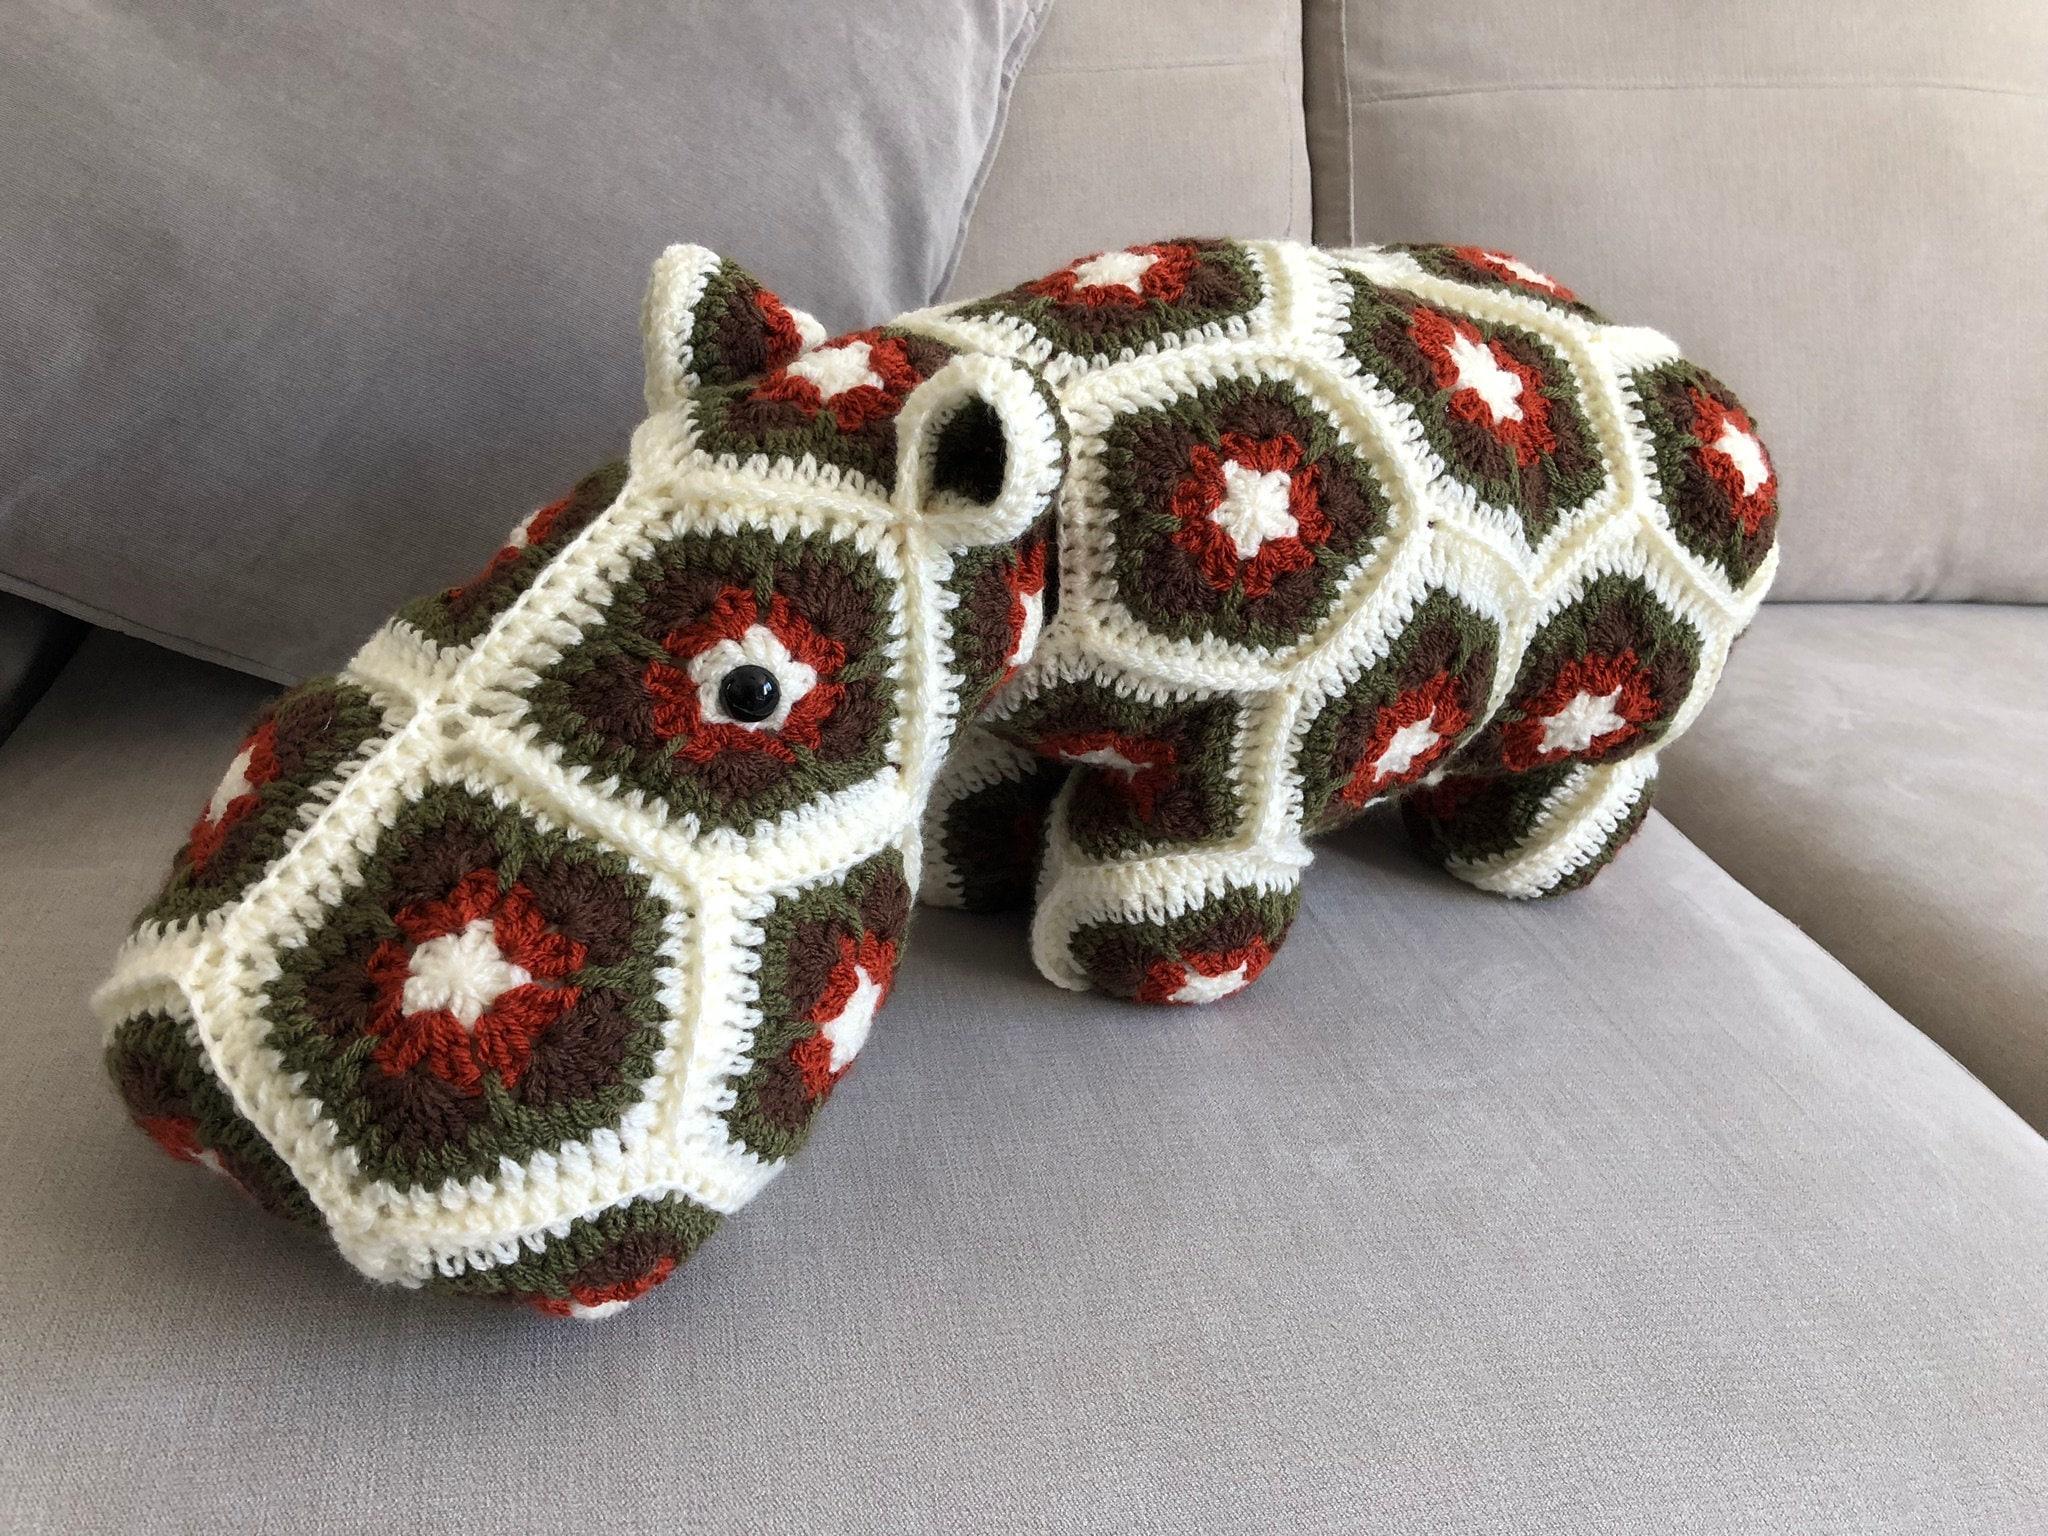 Nuevos Precios Más Bajos Mrs Bs autumn large crochet African flower hippo NicOUI